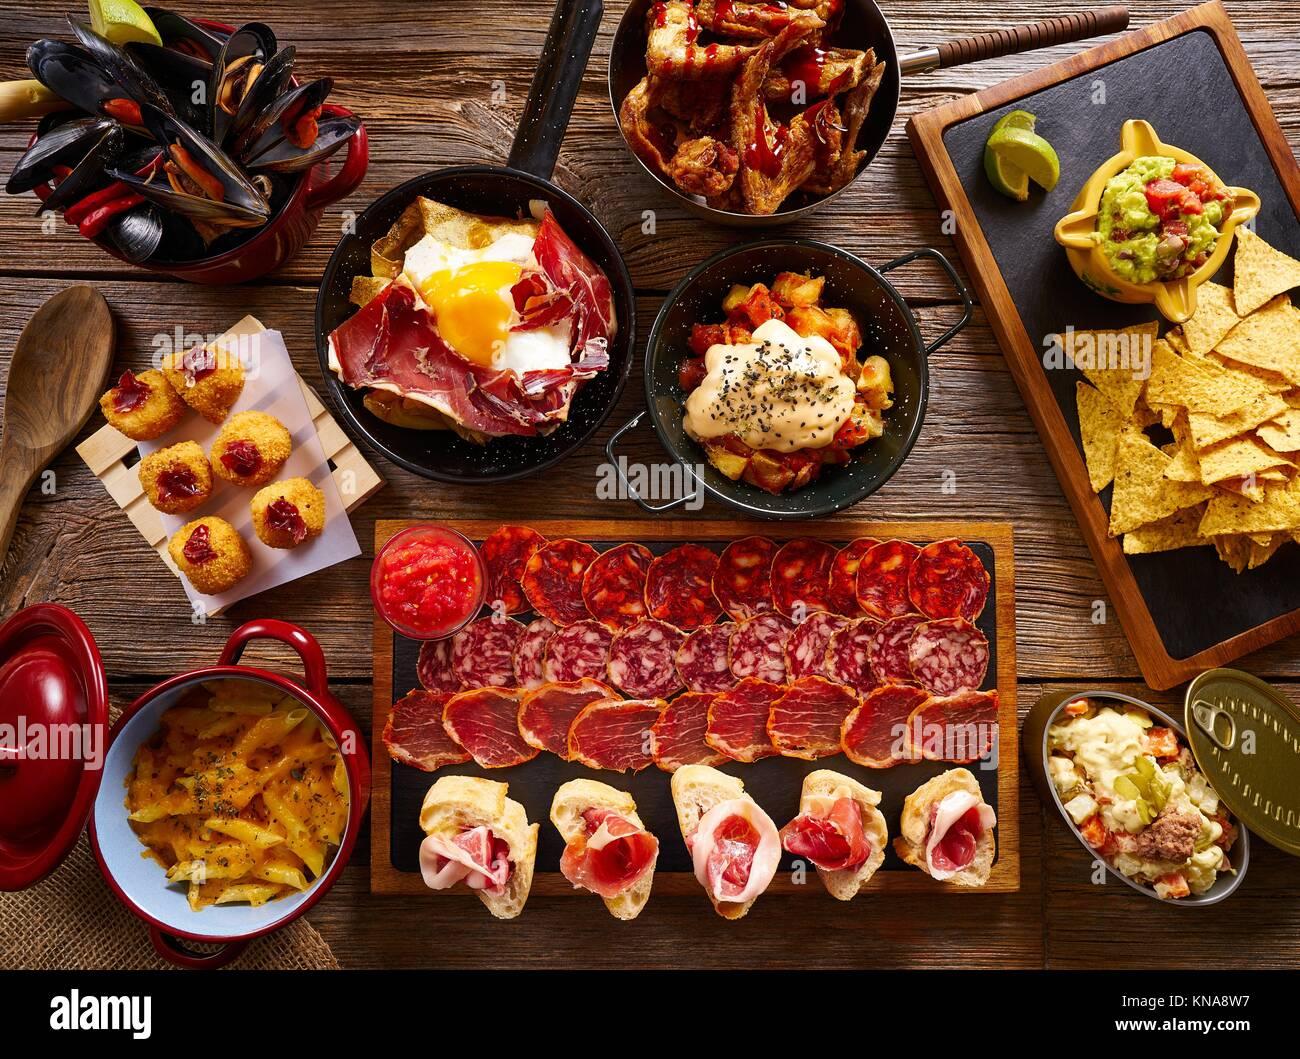 Tapas de España mezcla variada de recetas de comida mediterránea. Imagen De Stock